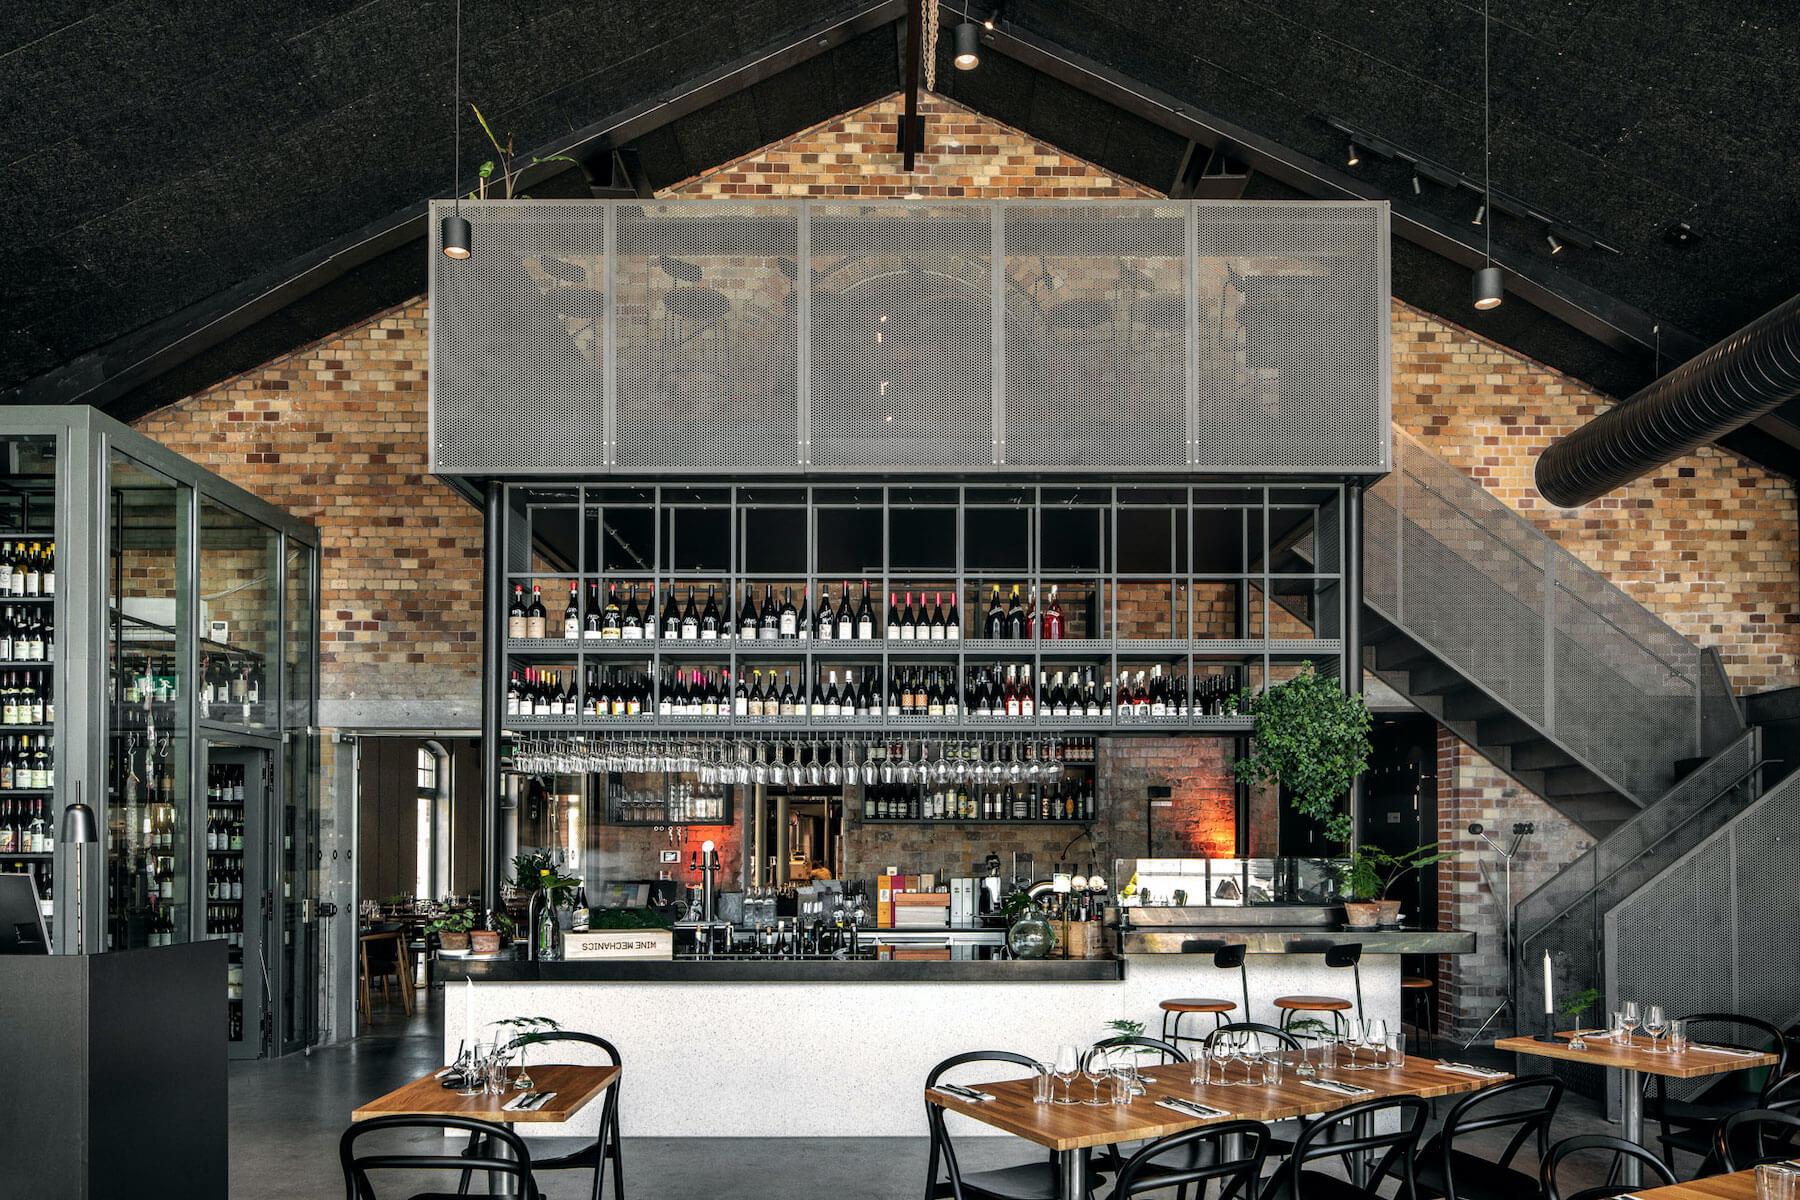 Wine mechanics restaurant front view of the winebar